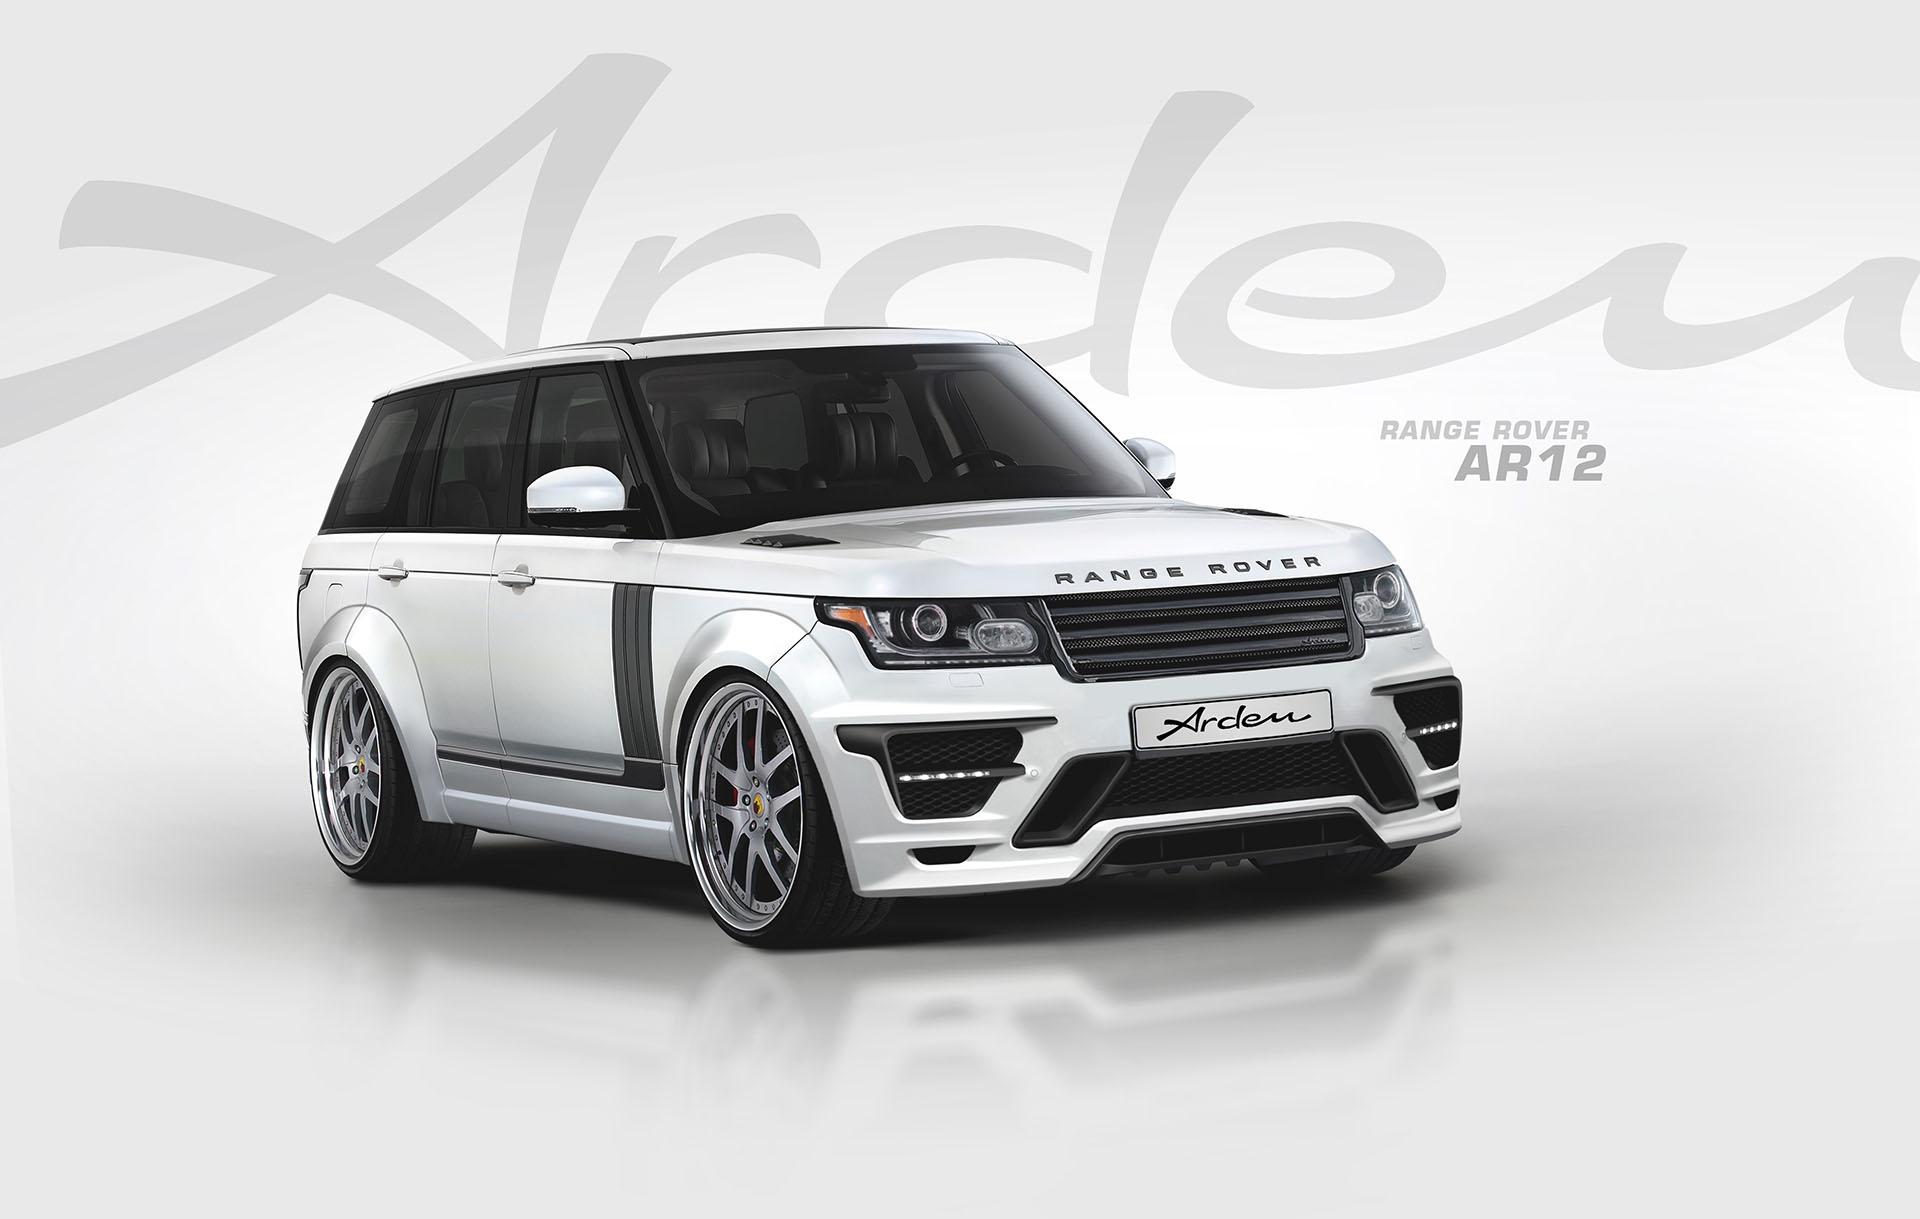 Arden Range Rover AR12